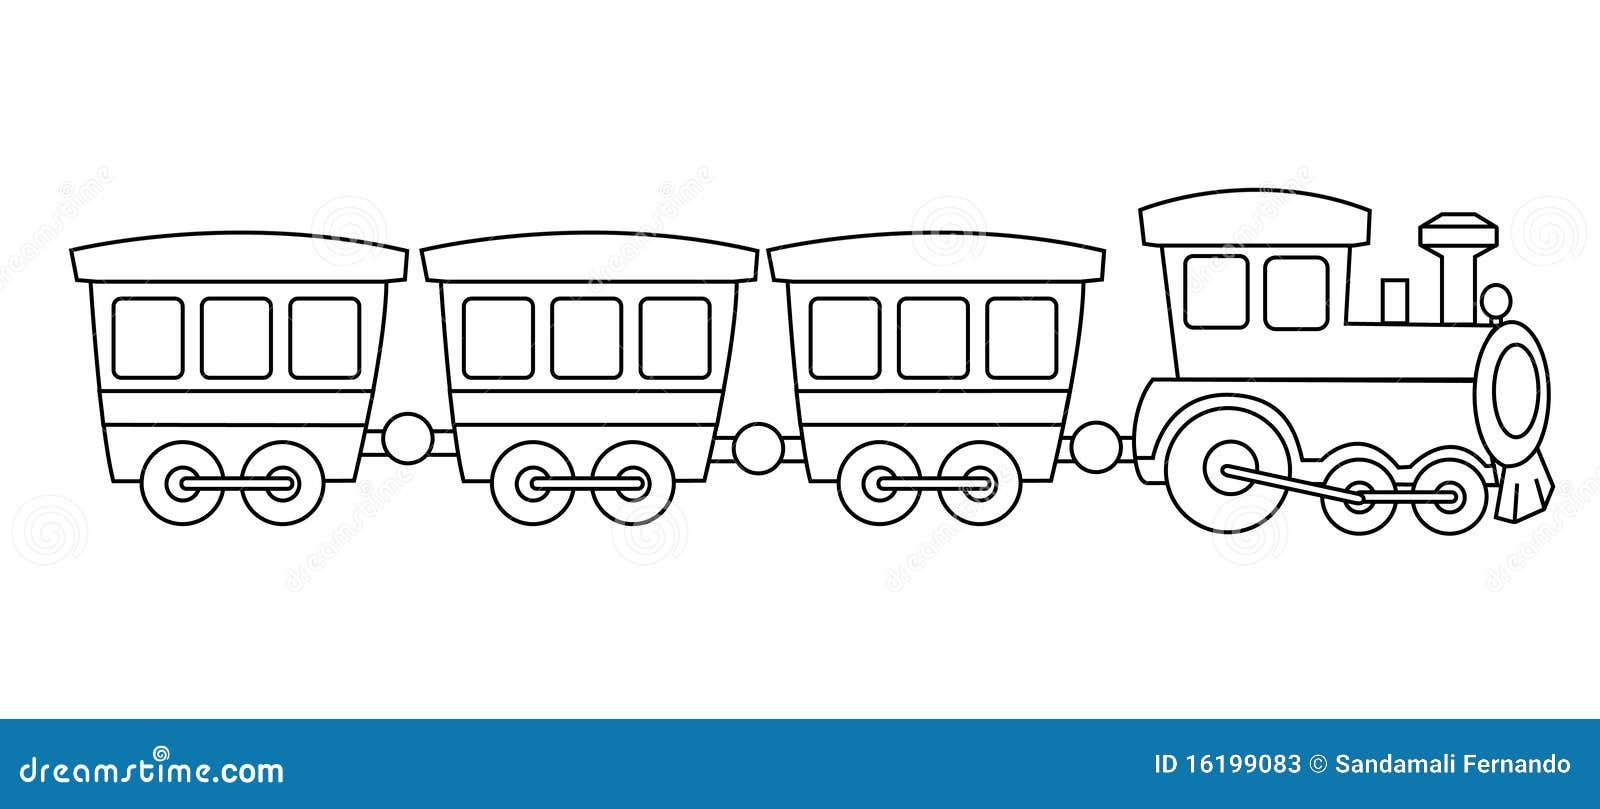 toy train stock photos image 16199083 drum major clipart drum major clipart